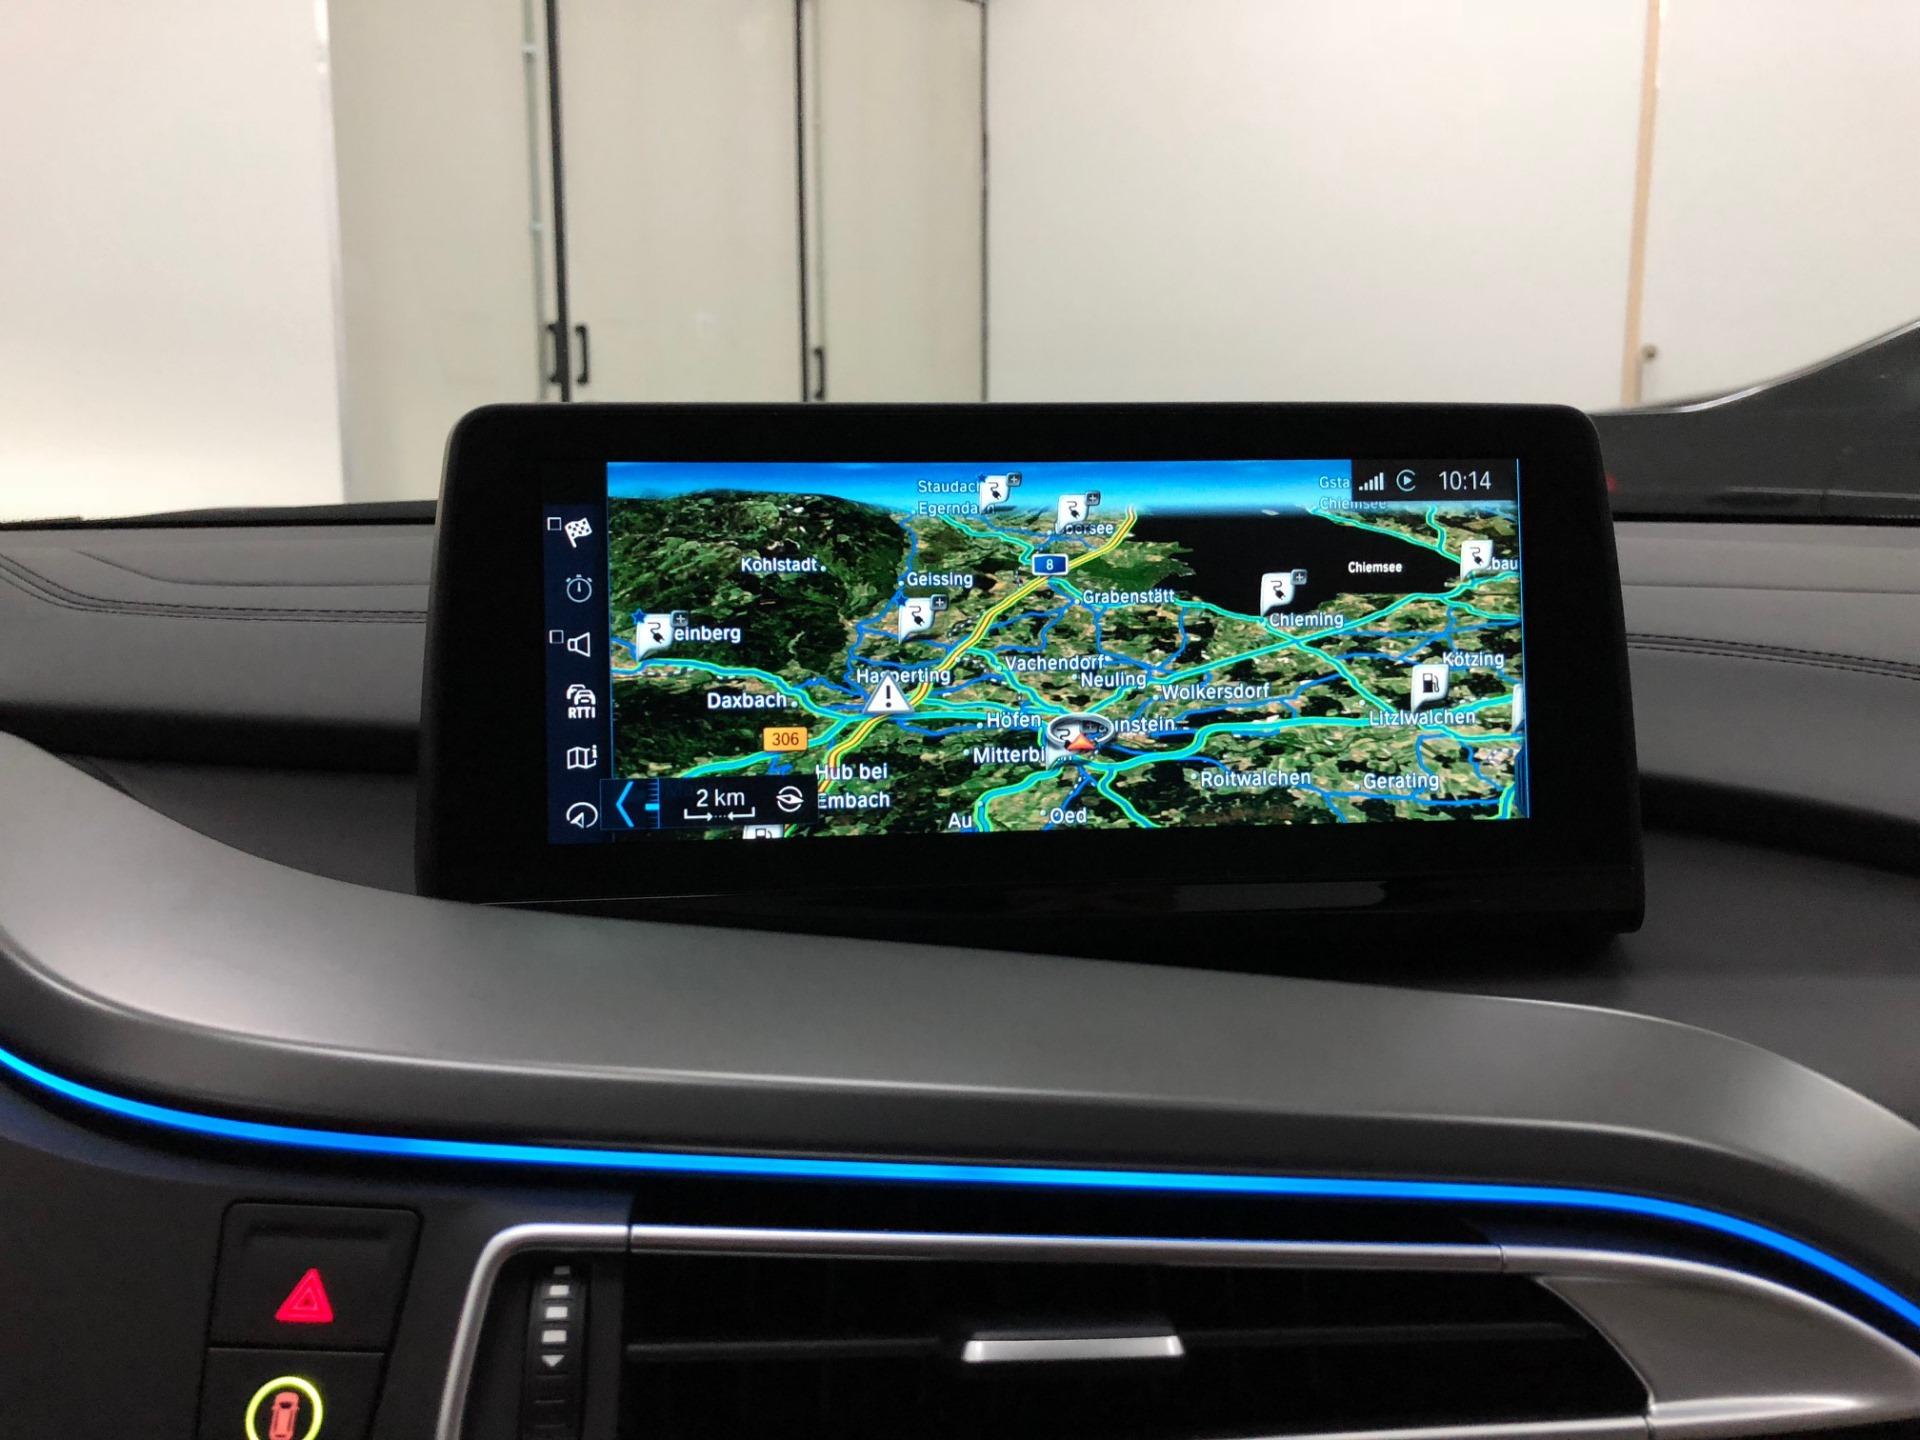 BMW i8 iDrive ID6 Umbau 2018 Infotainment Bimmer Manufaktur 03